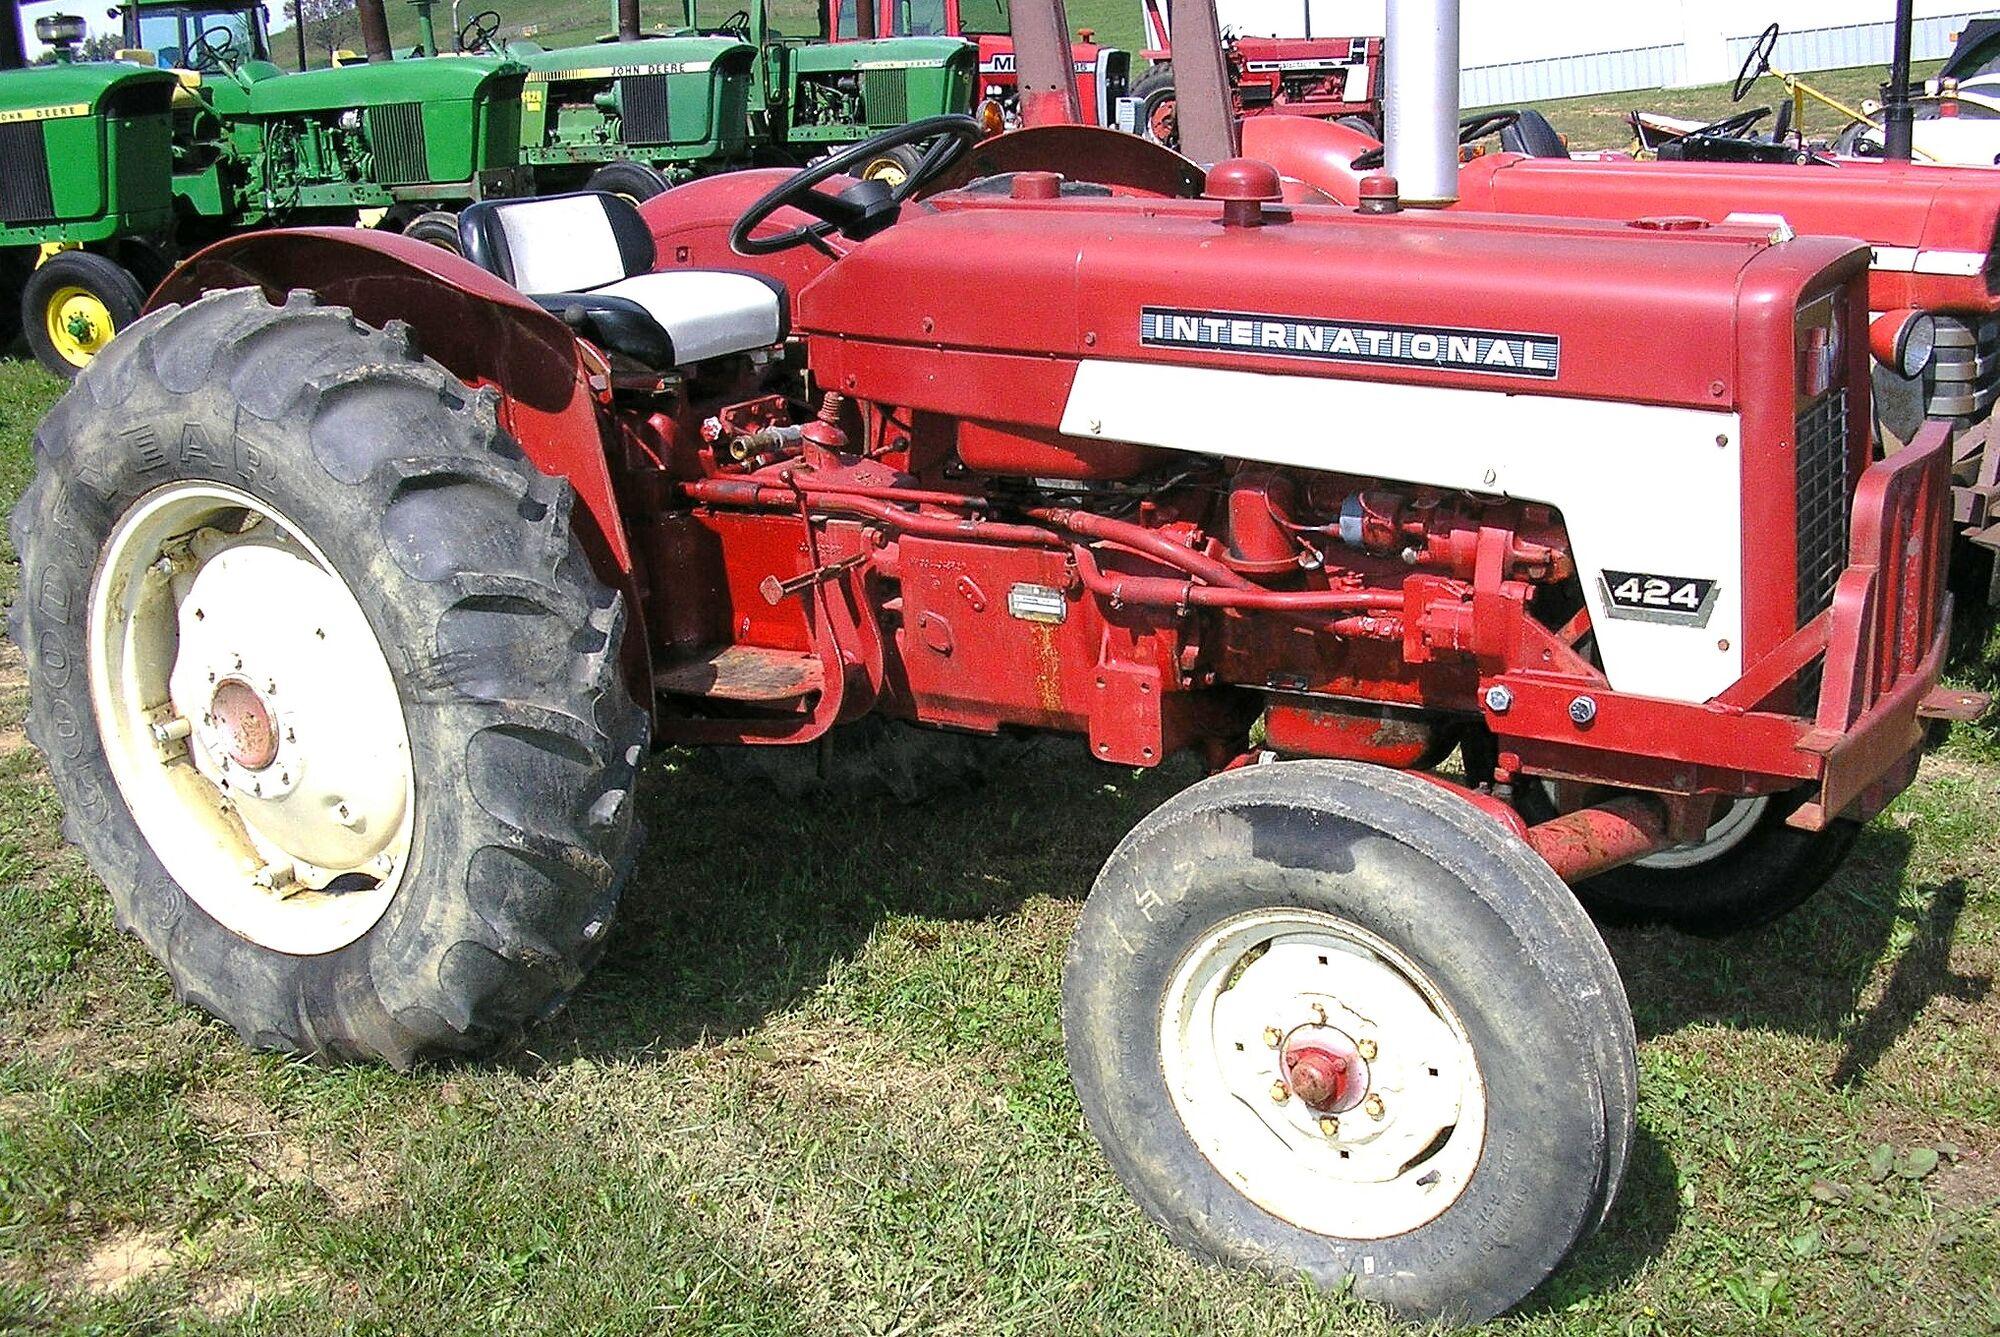 Ih 2424 Tractor Loader : International harvester tractor construction plant